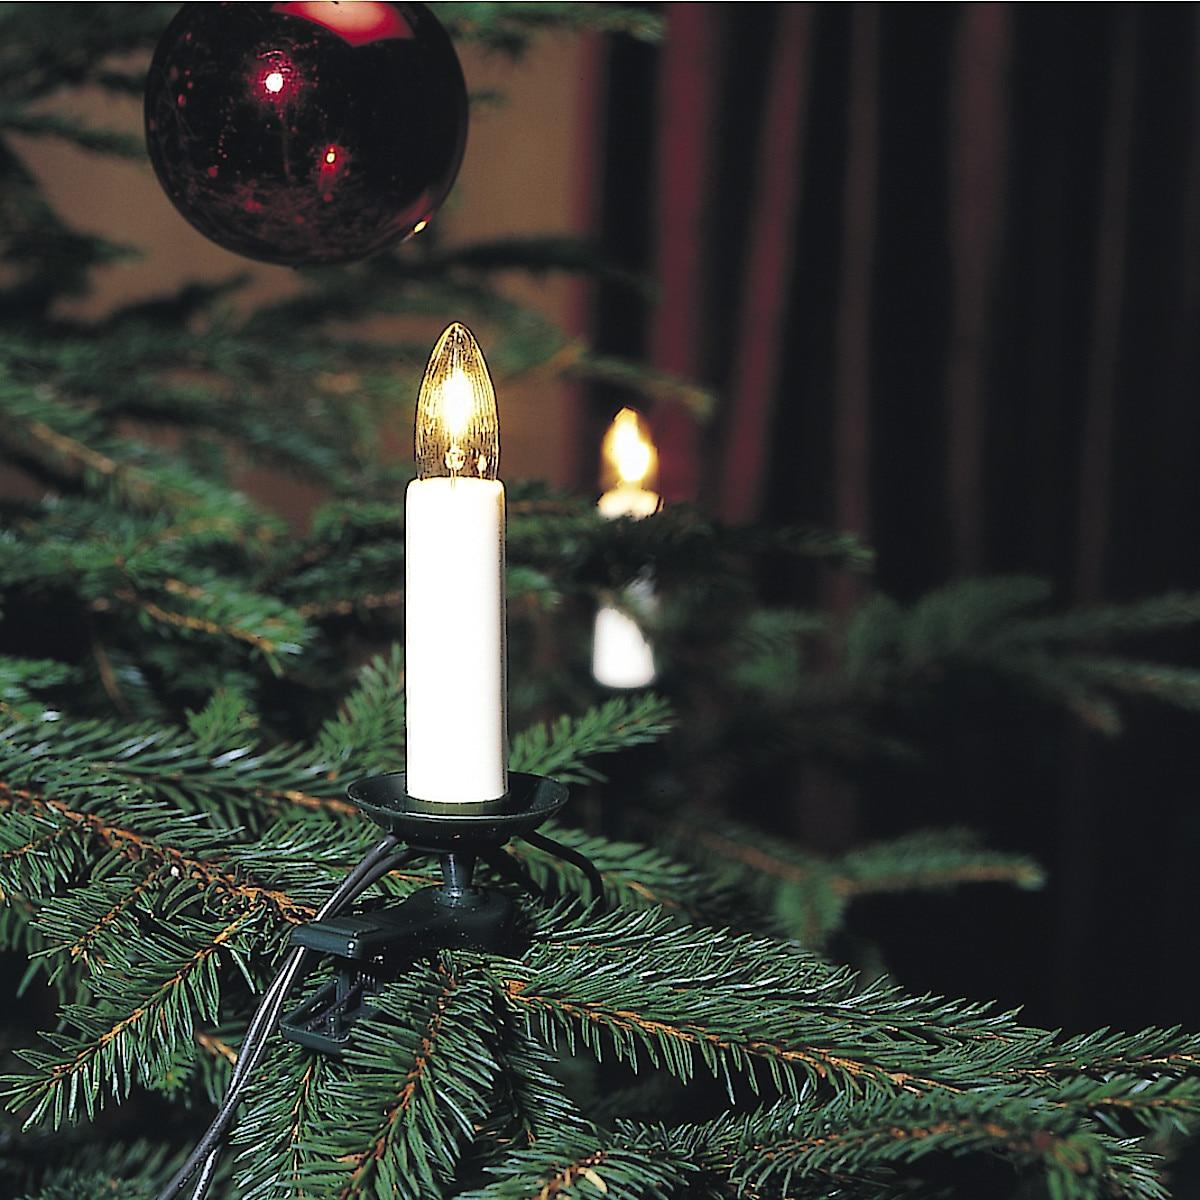 Juletrebelysning